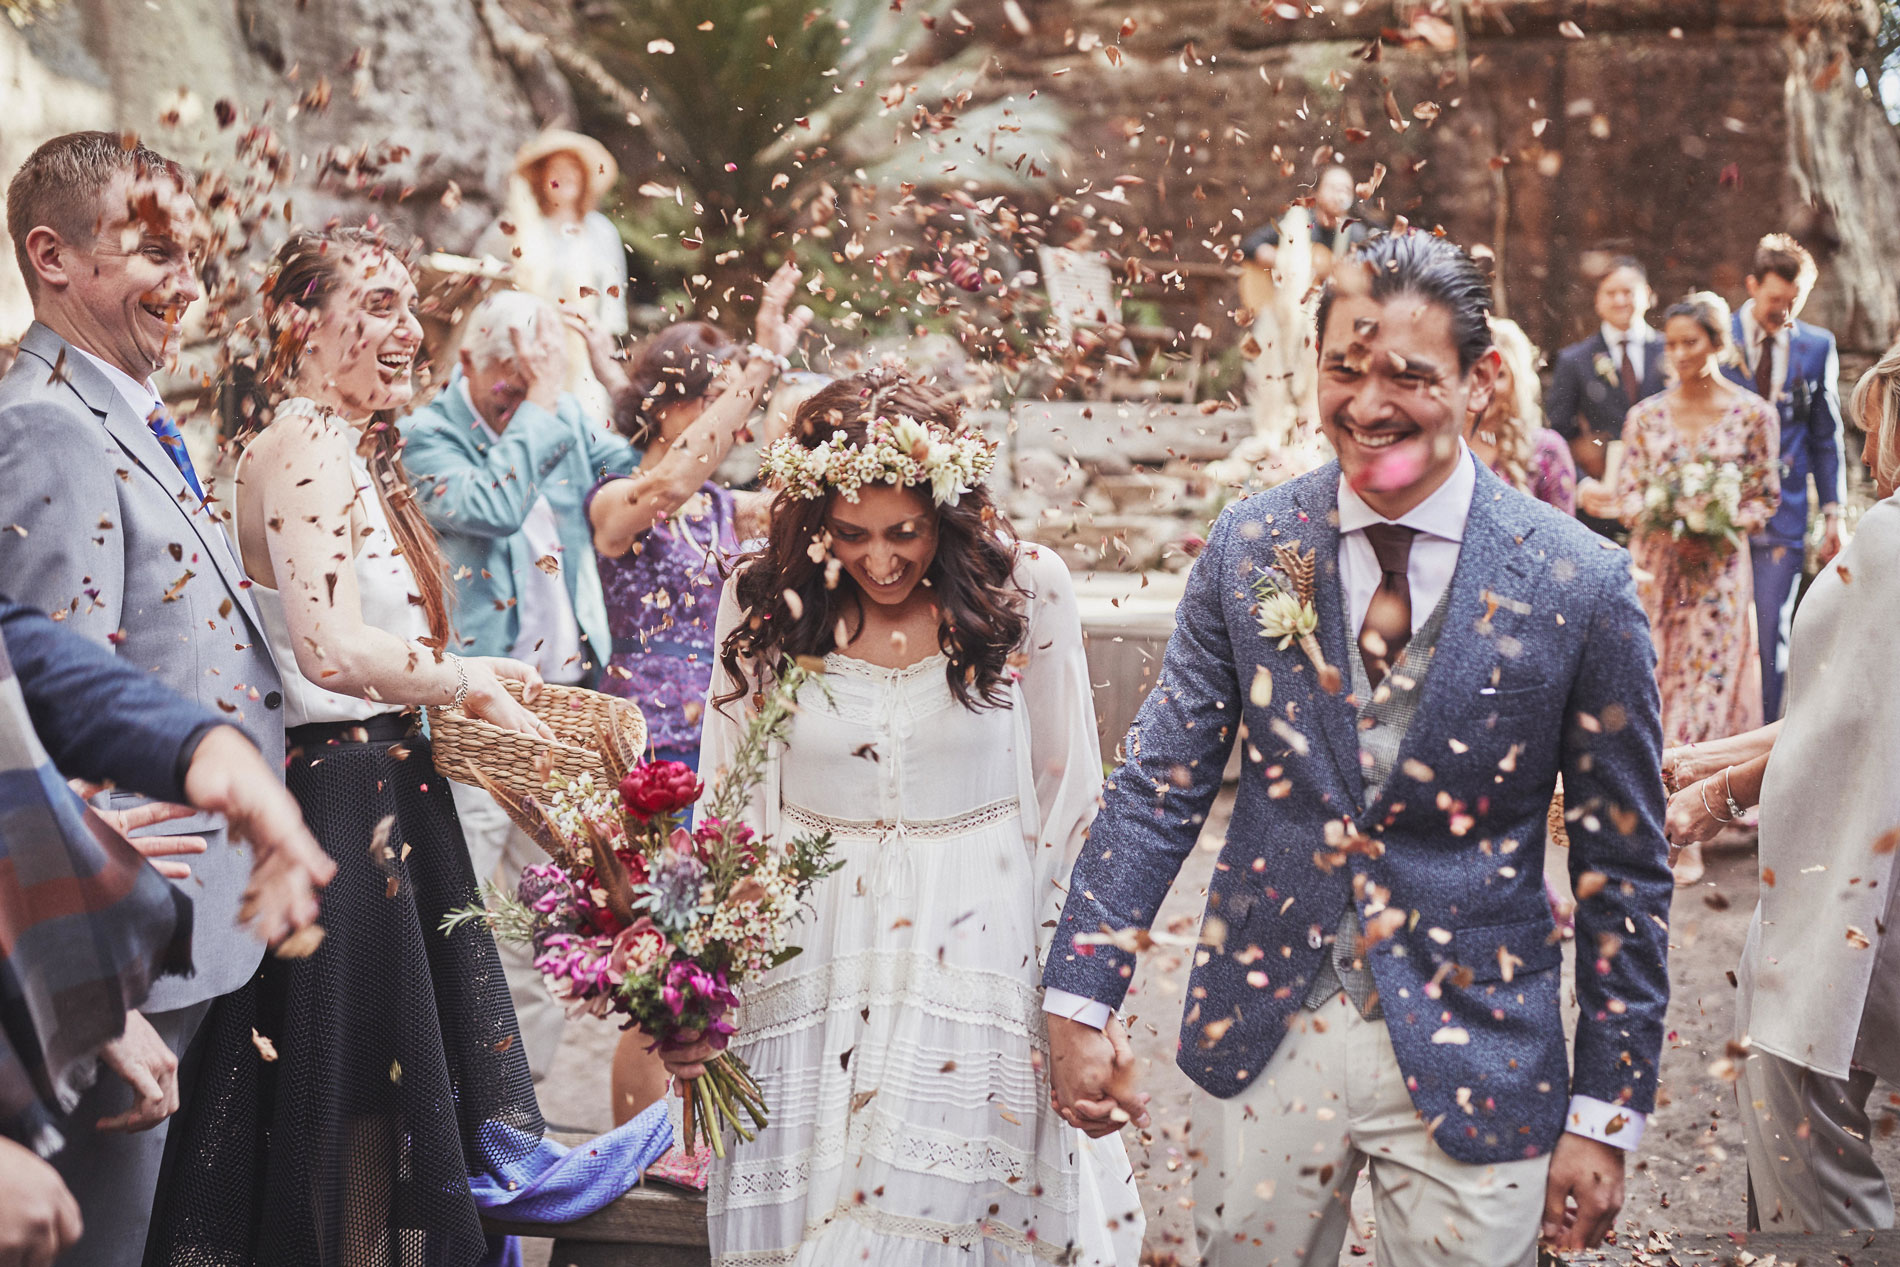 wedding_flowers_brooke_pierre13.jpg